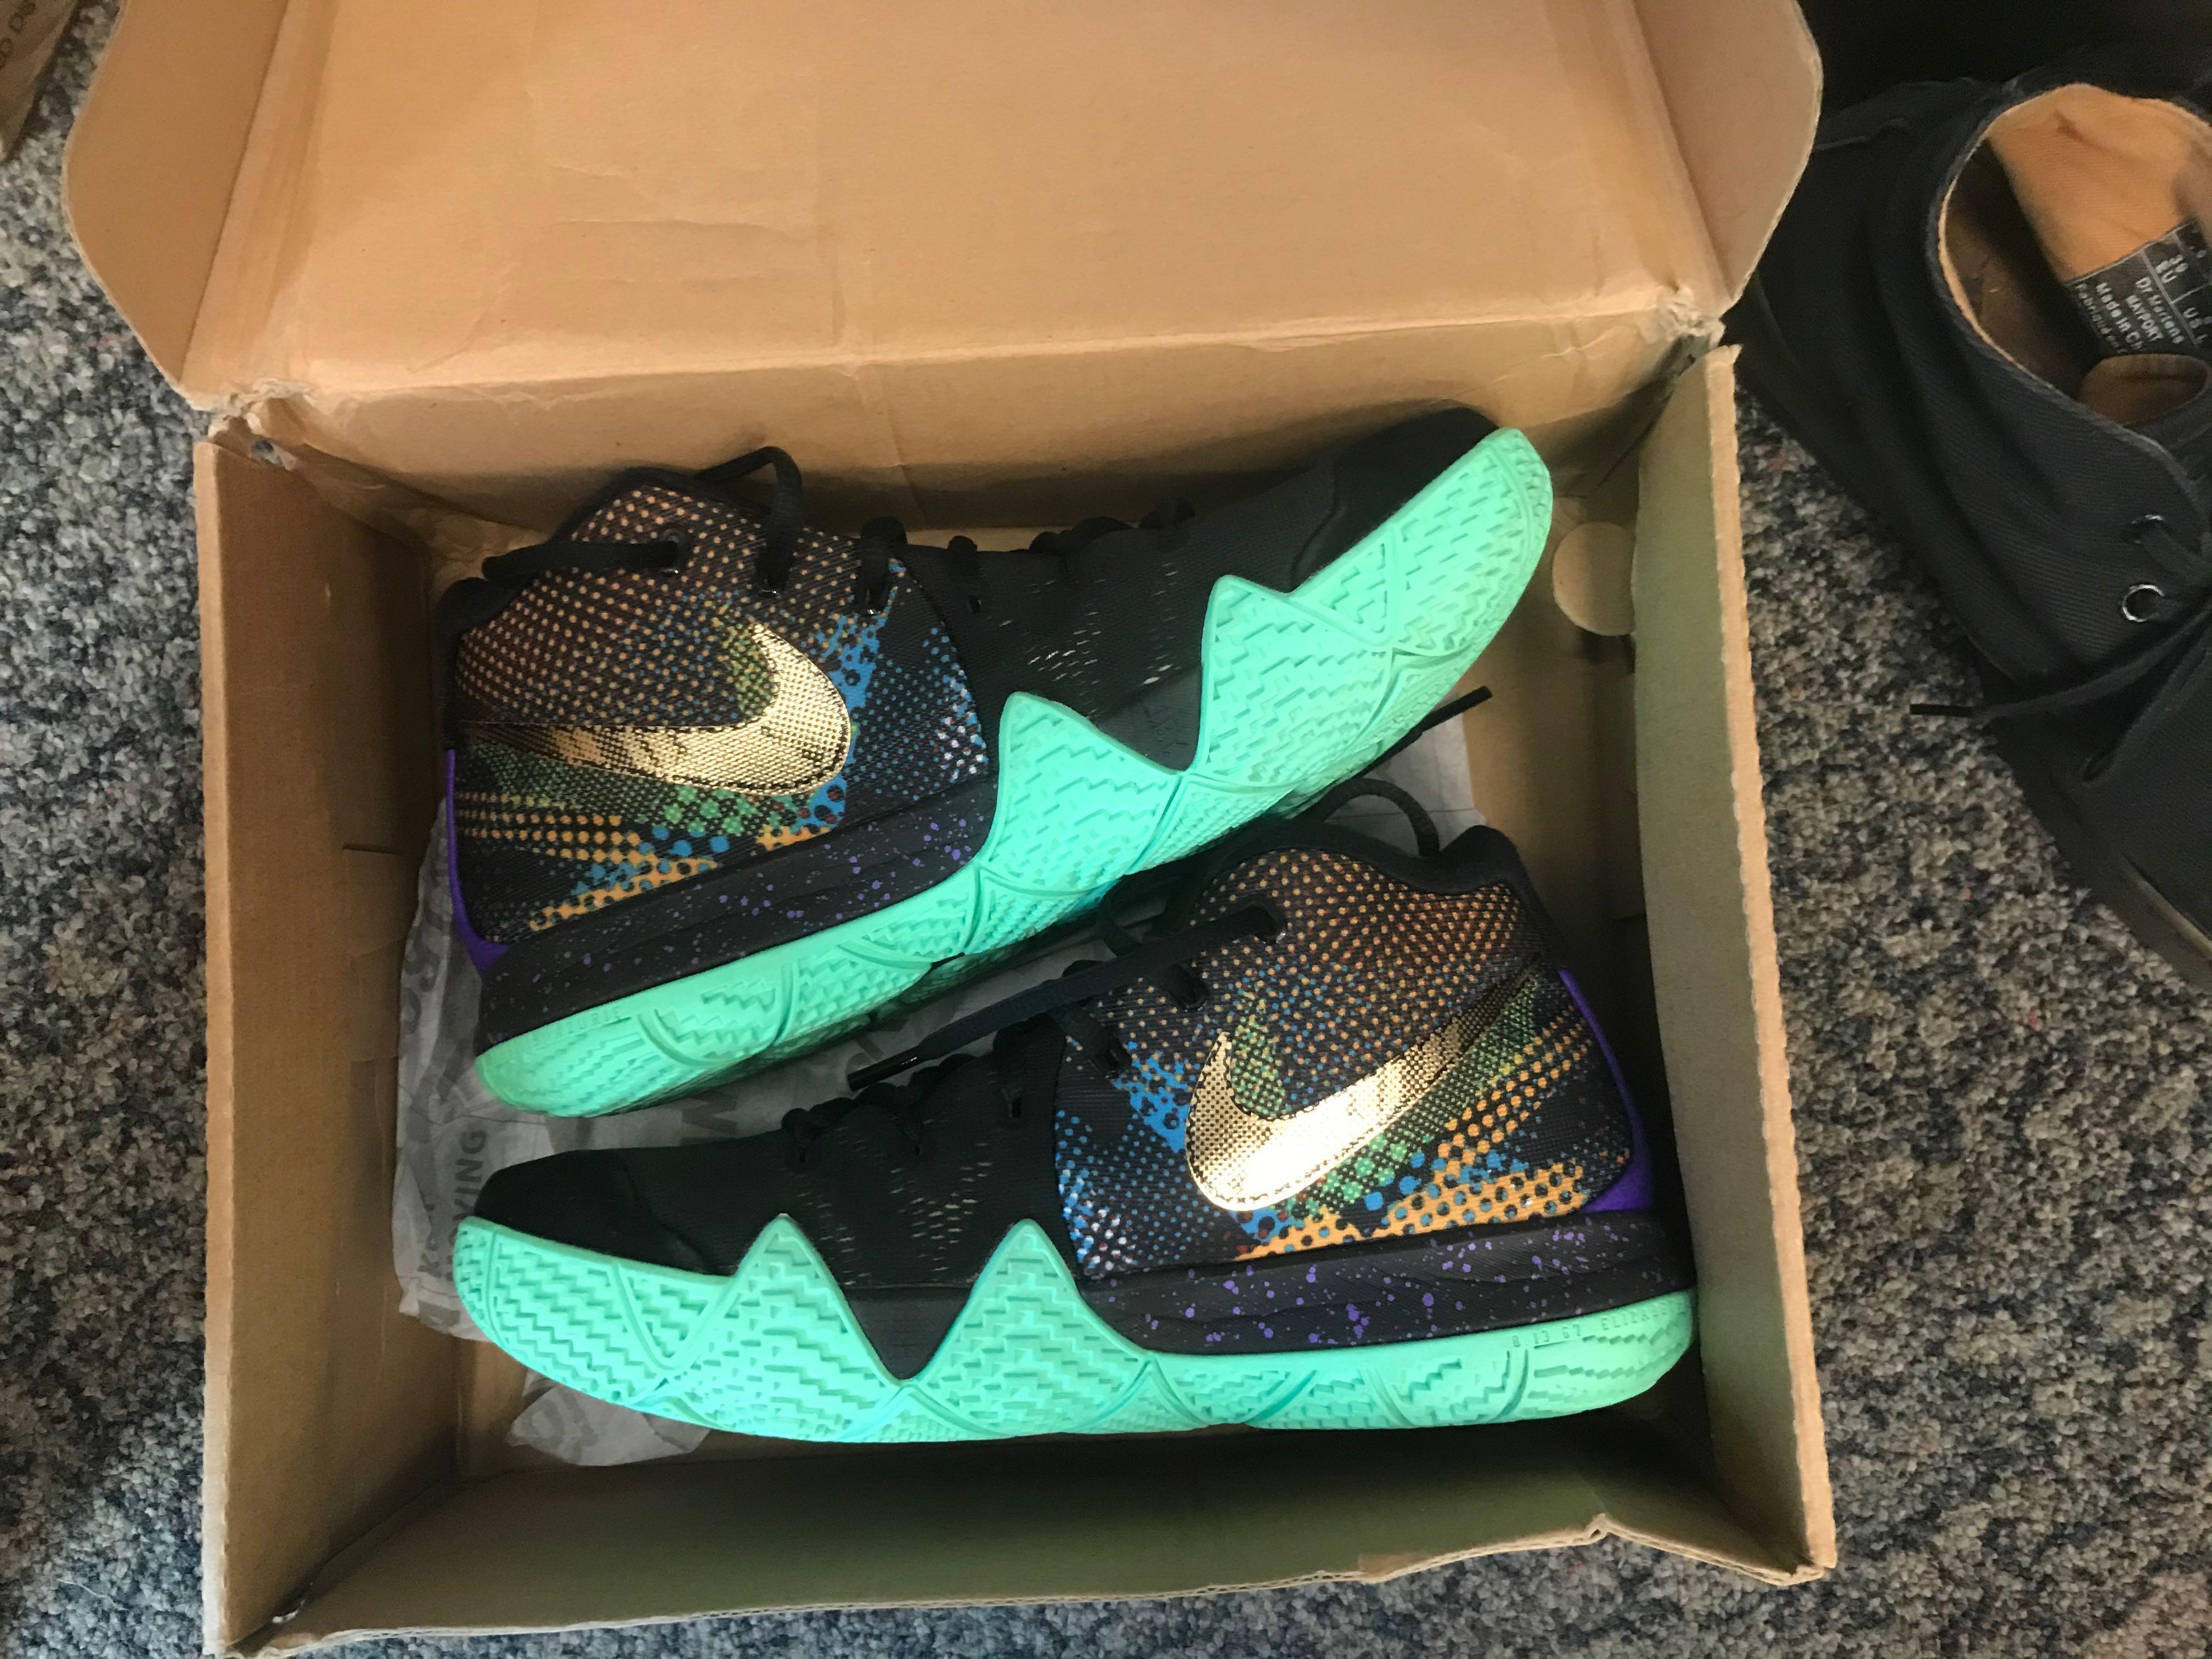 Nike Kyrie 4 Mamba Us7.5